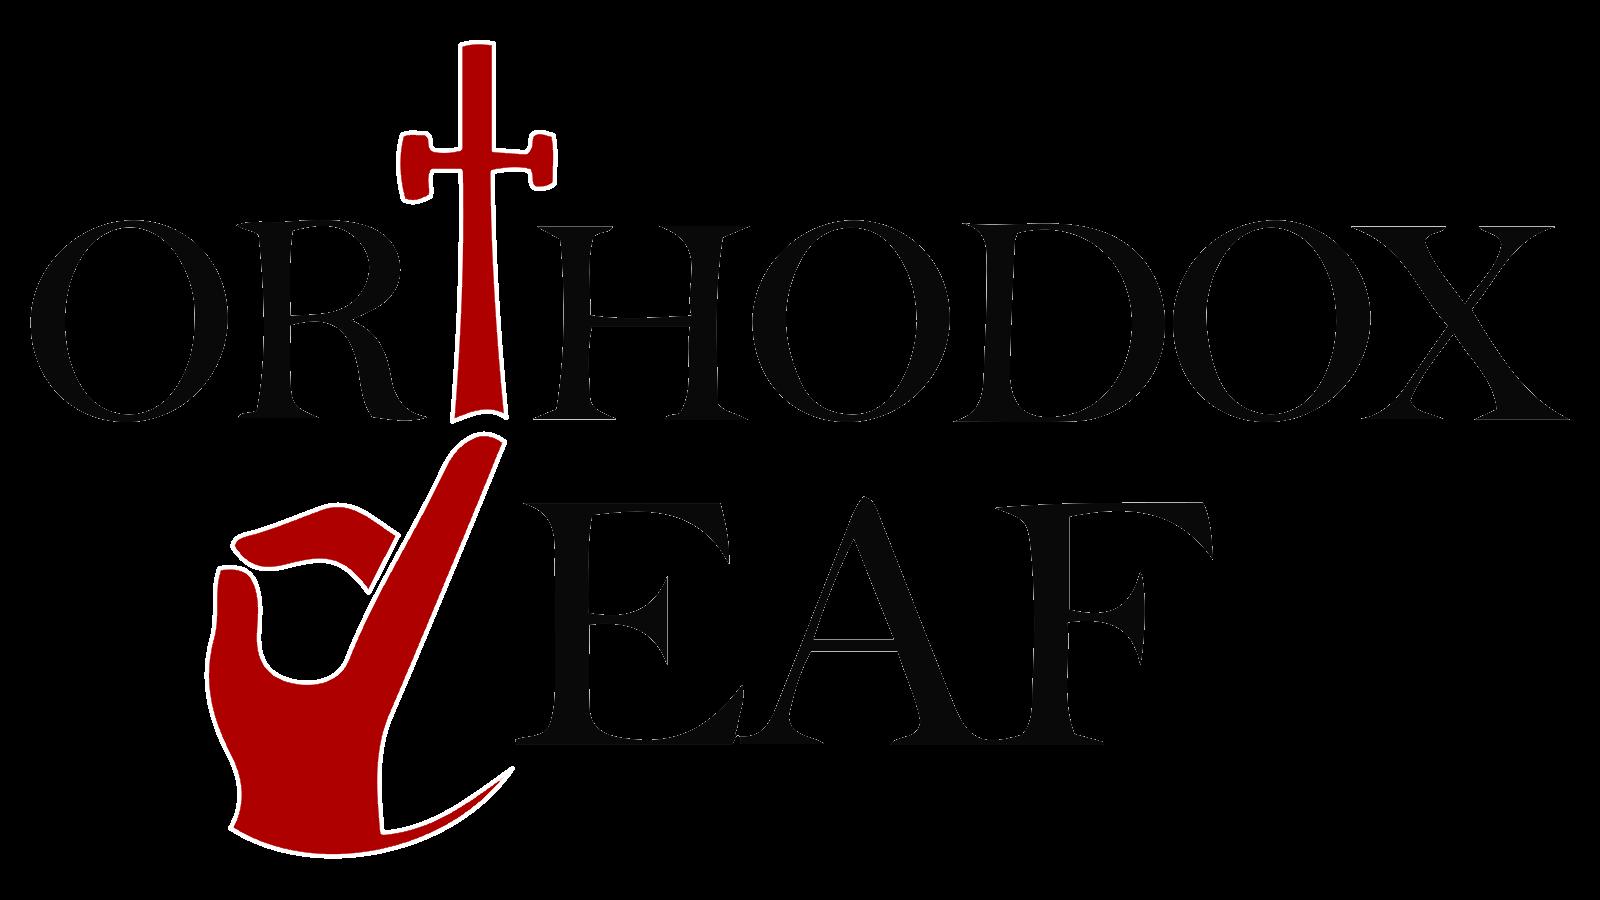 orthodox-deaf-logo.png